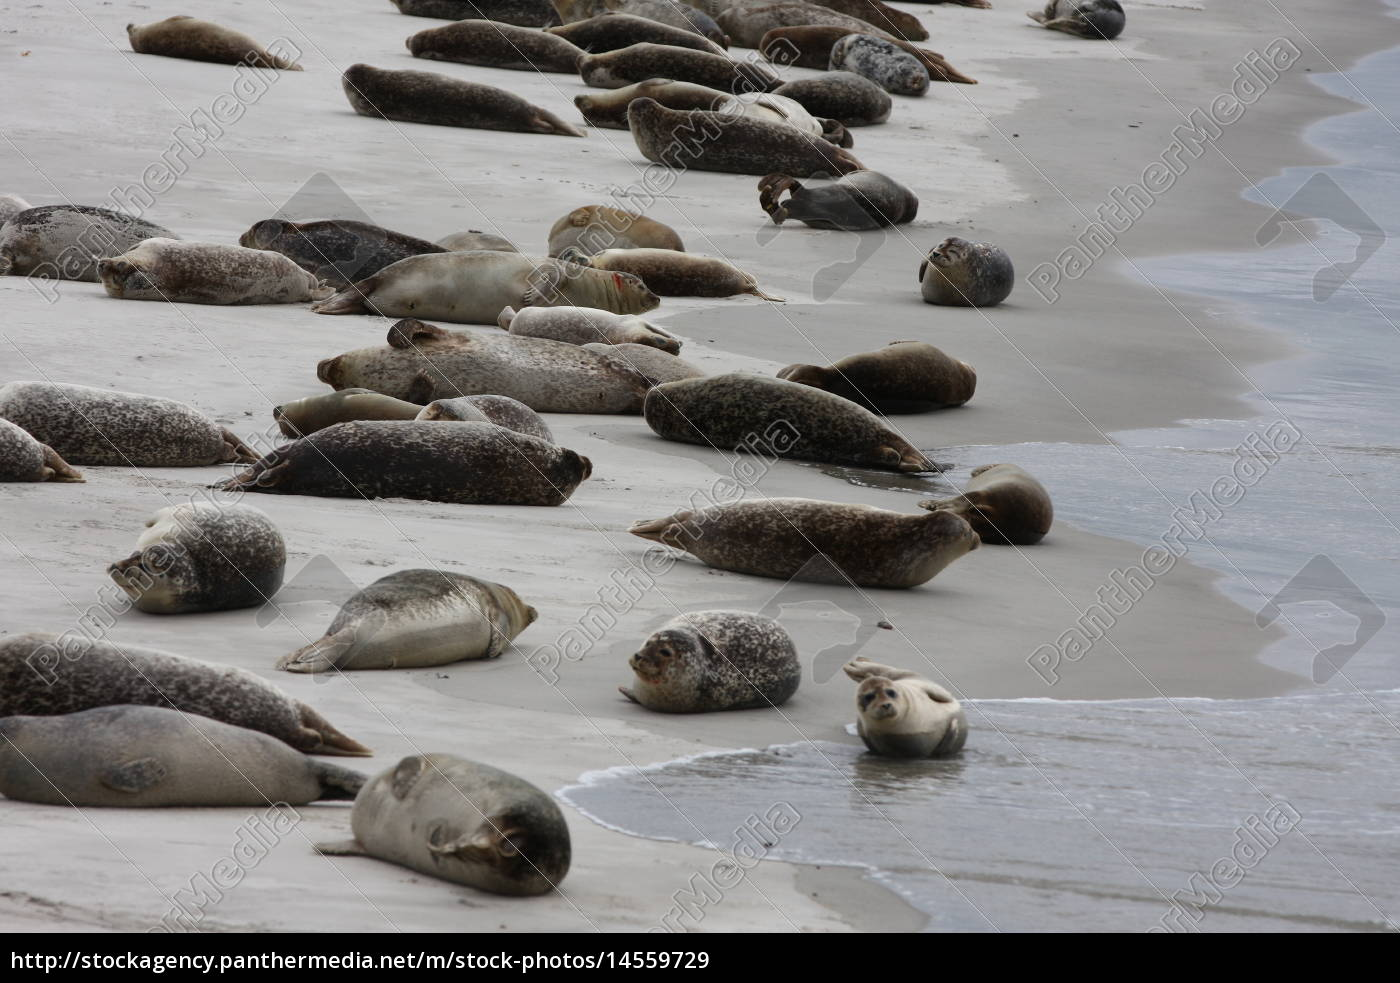 Düne, Helgoland, Kegelrobben, Robben, Säugetier, Wasser - 14559729